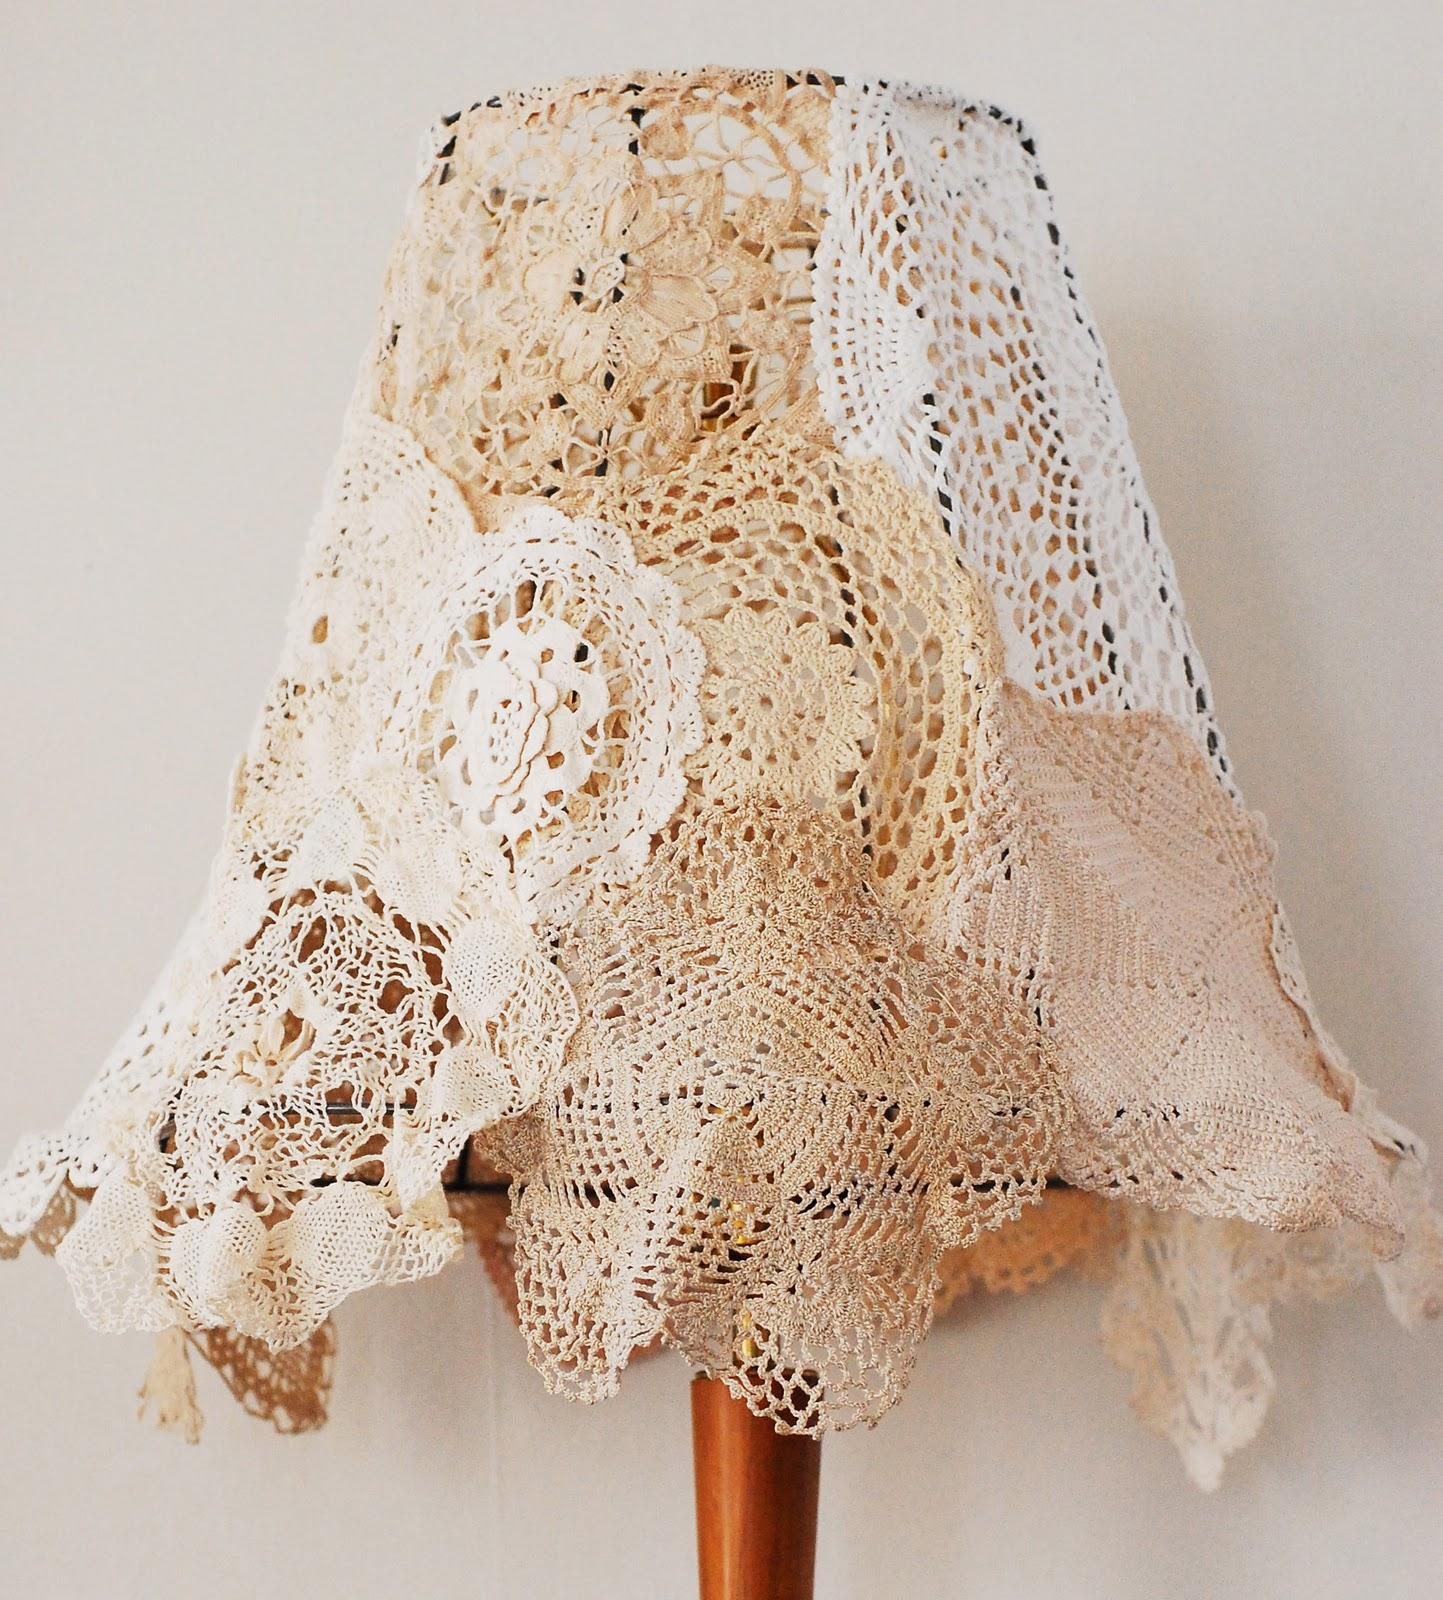 Vintage Lamp Shades: Maize Hutton: Vintage Doily Lampshade DIY